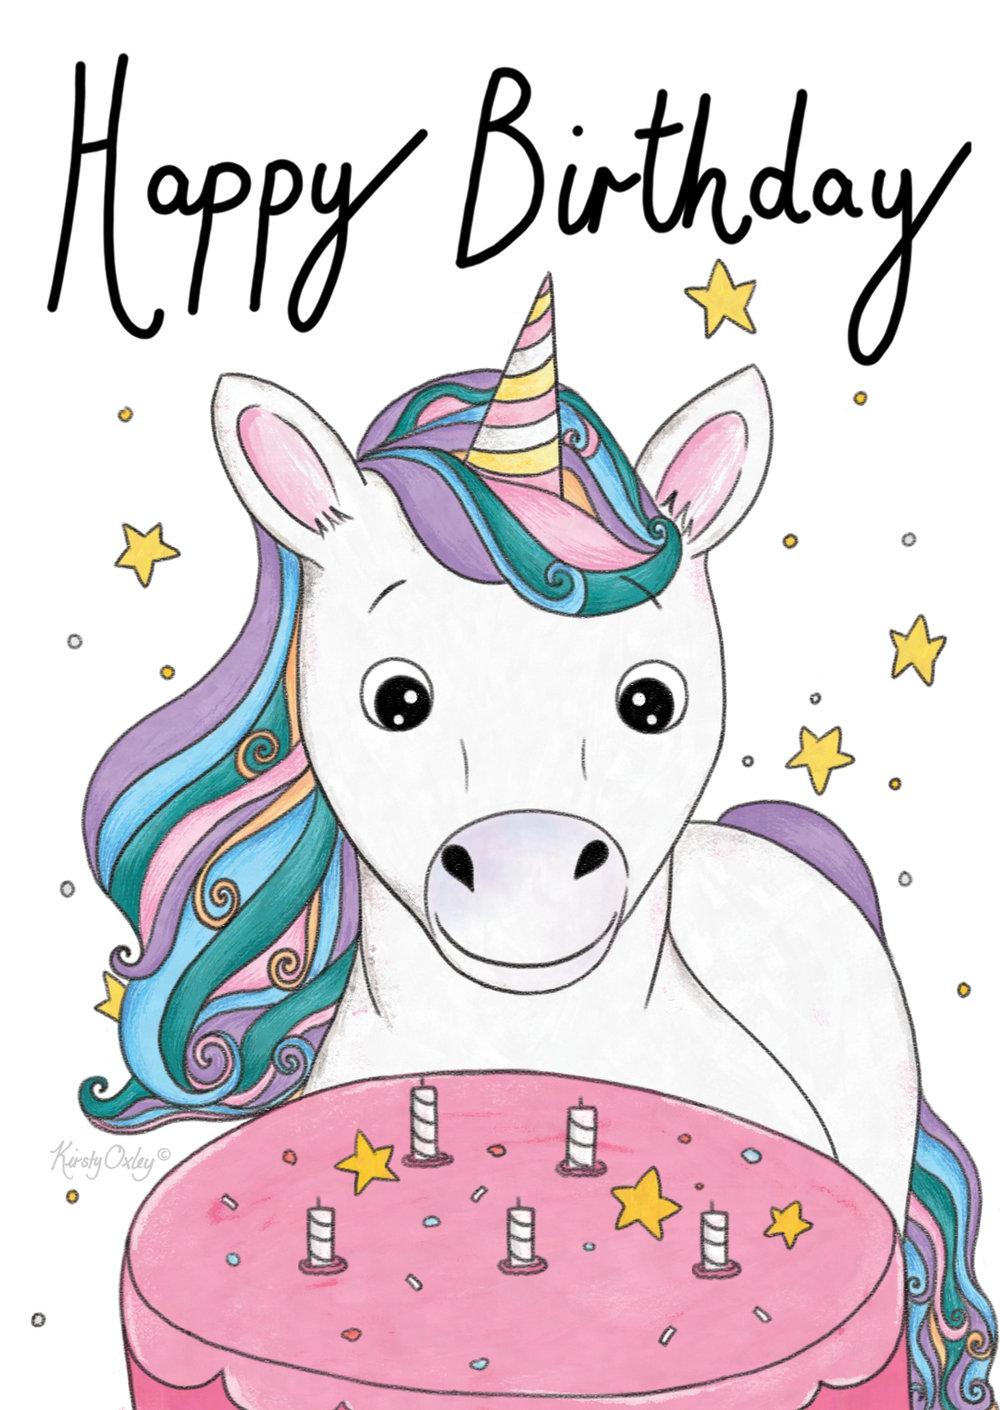 Unicorn_Birthday_Card_Kirsty_Oxley_Illustration_White_writing_sig.jpg